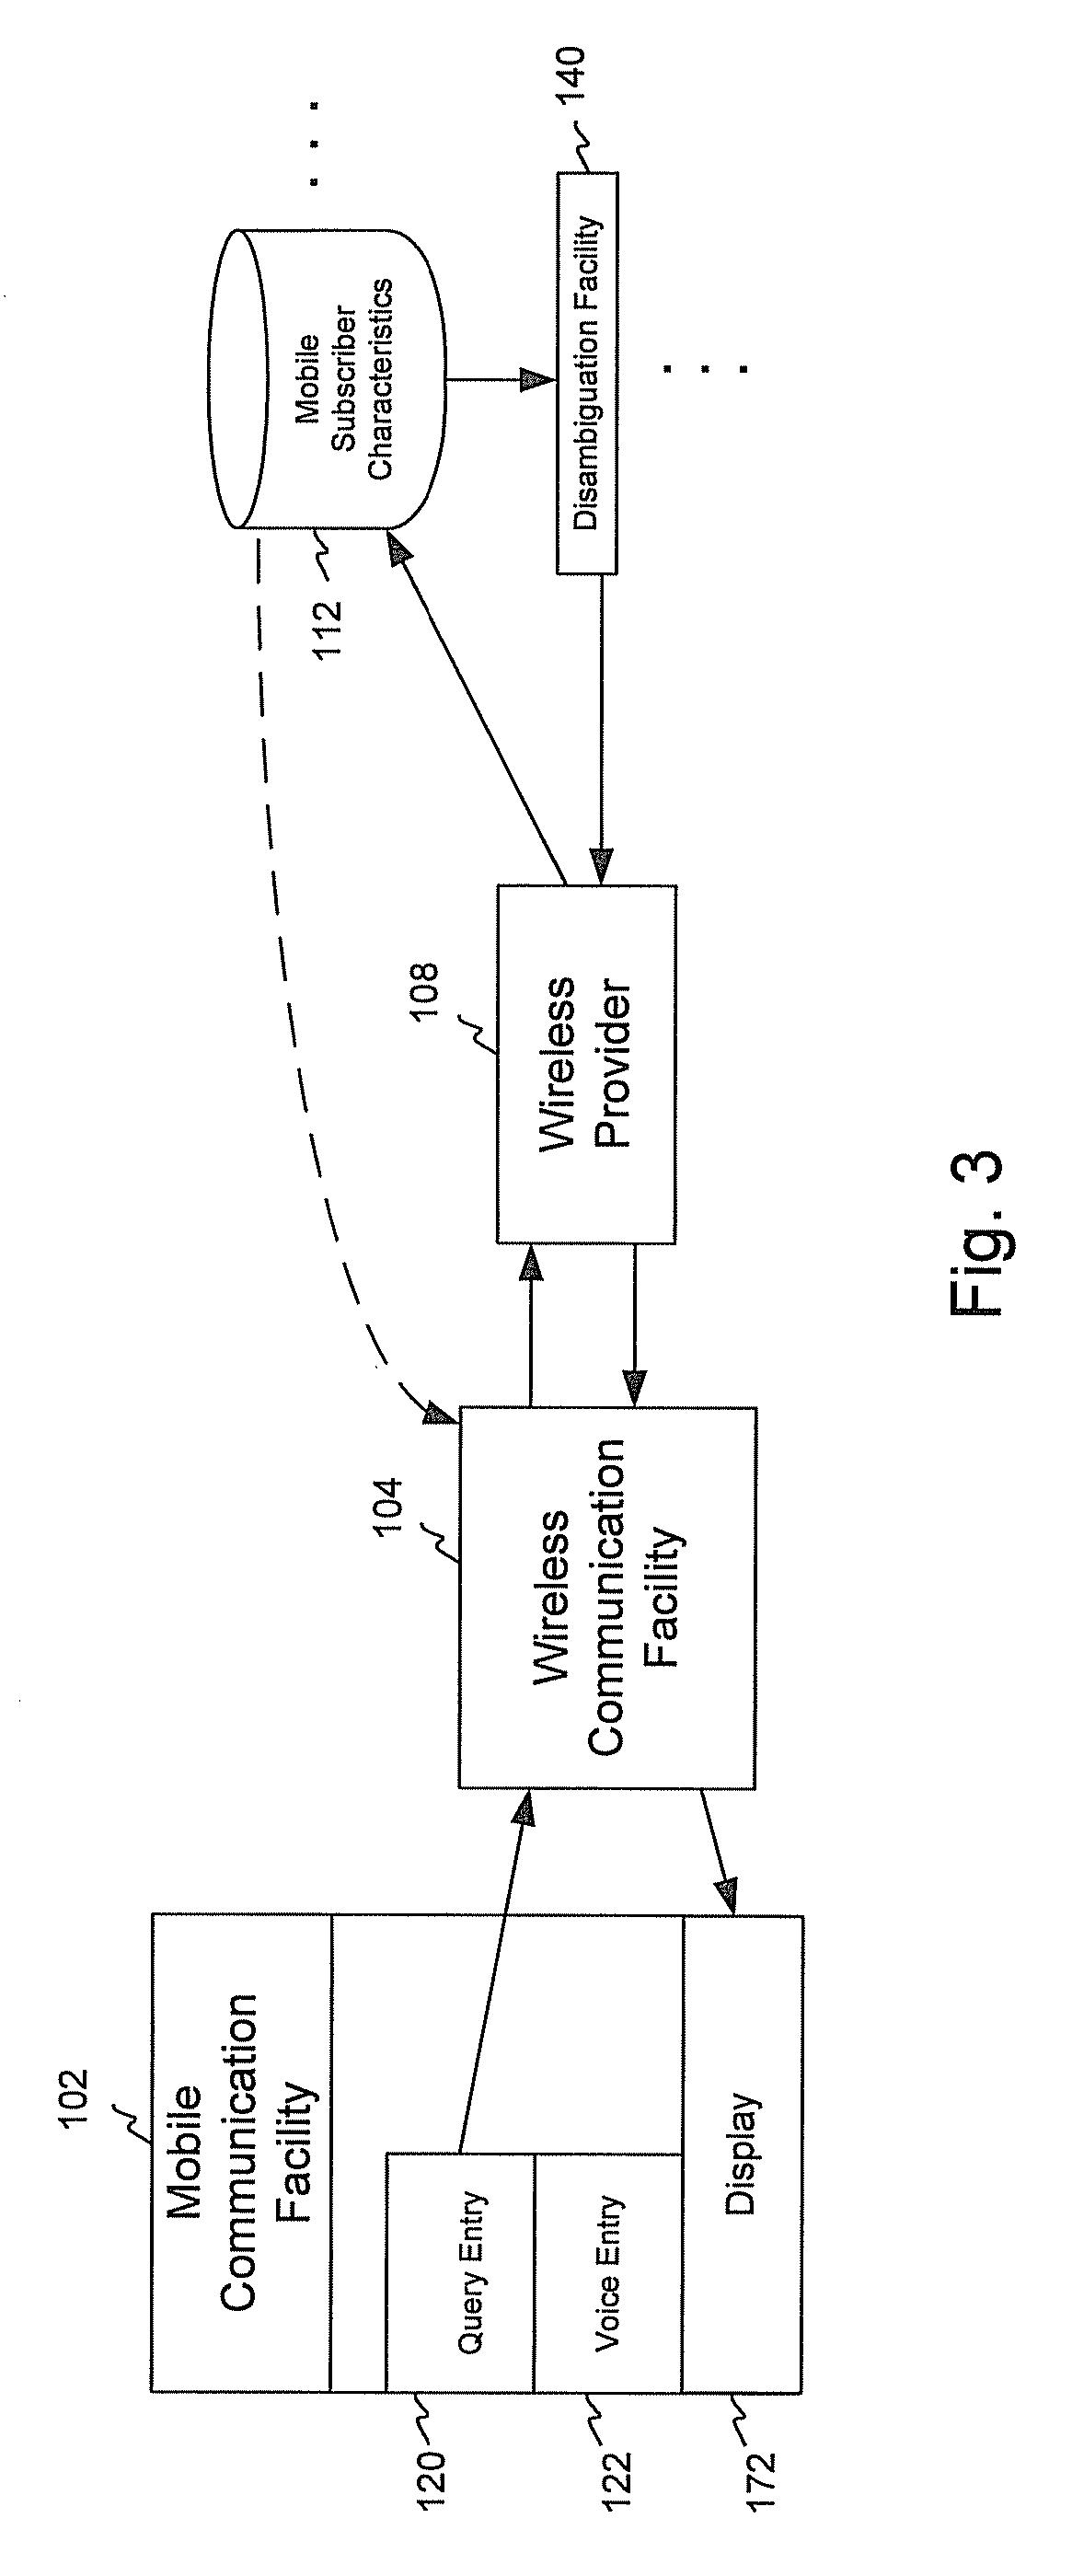 Patent Us 9058406 B2 Ups Circuit Diagram Urdu